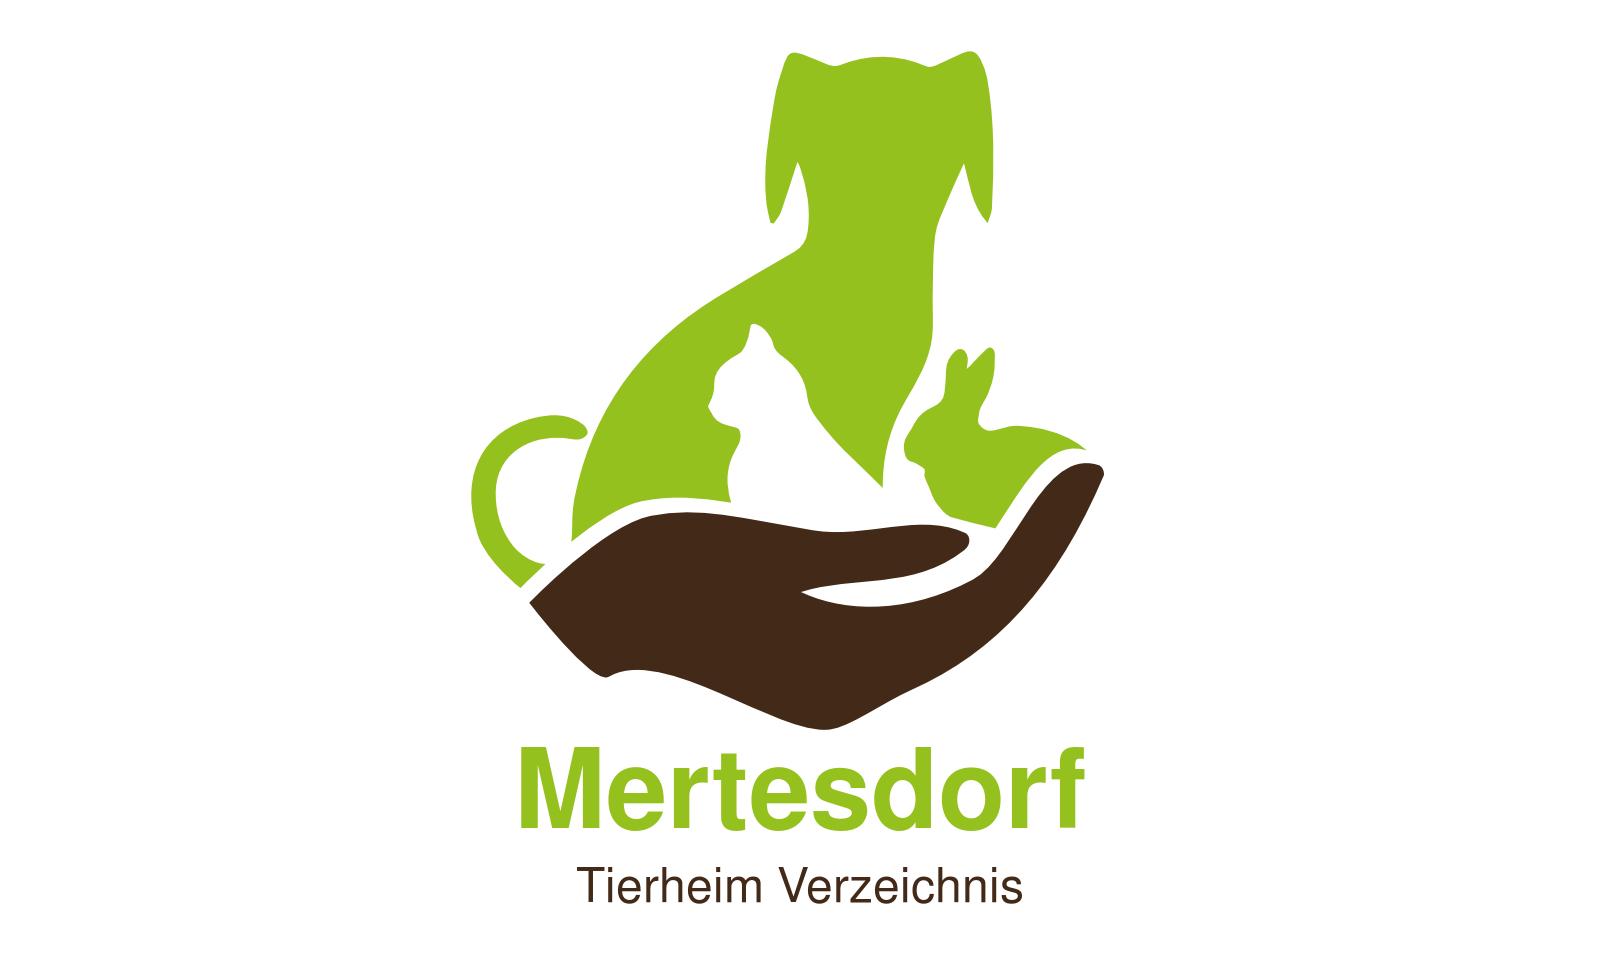 Tierheim Mertesdorf